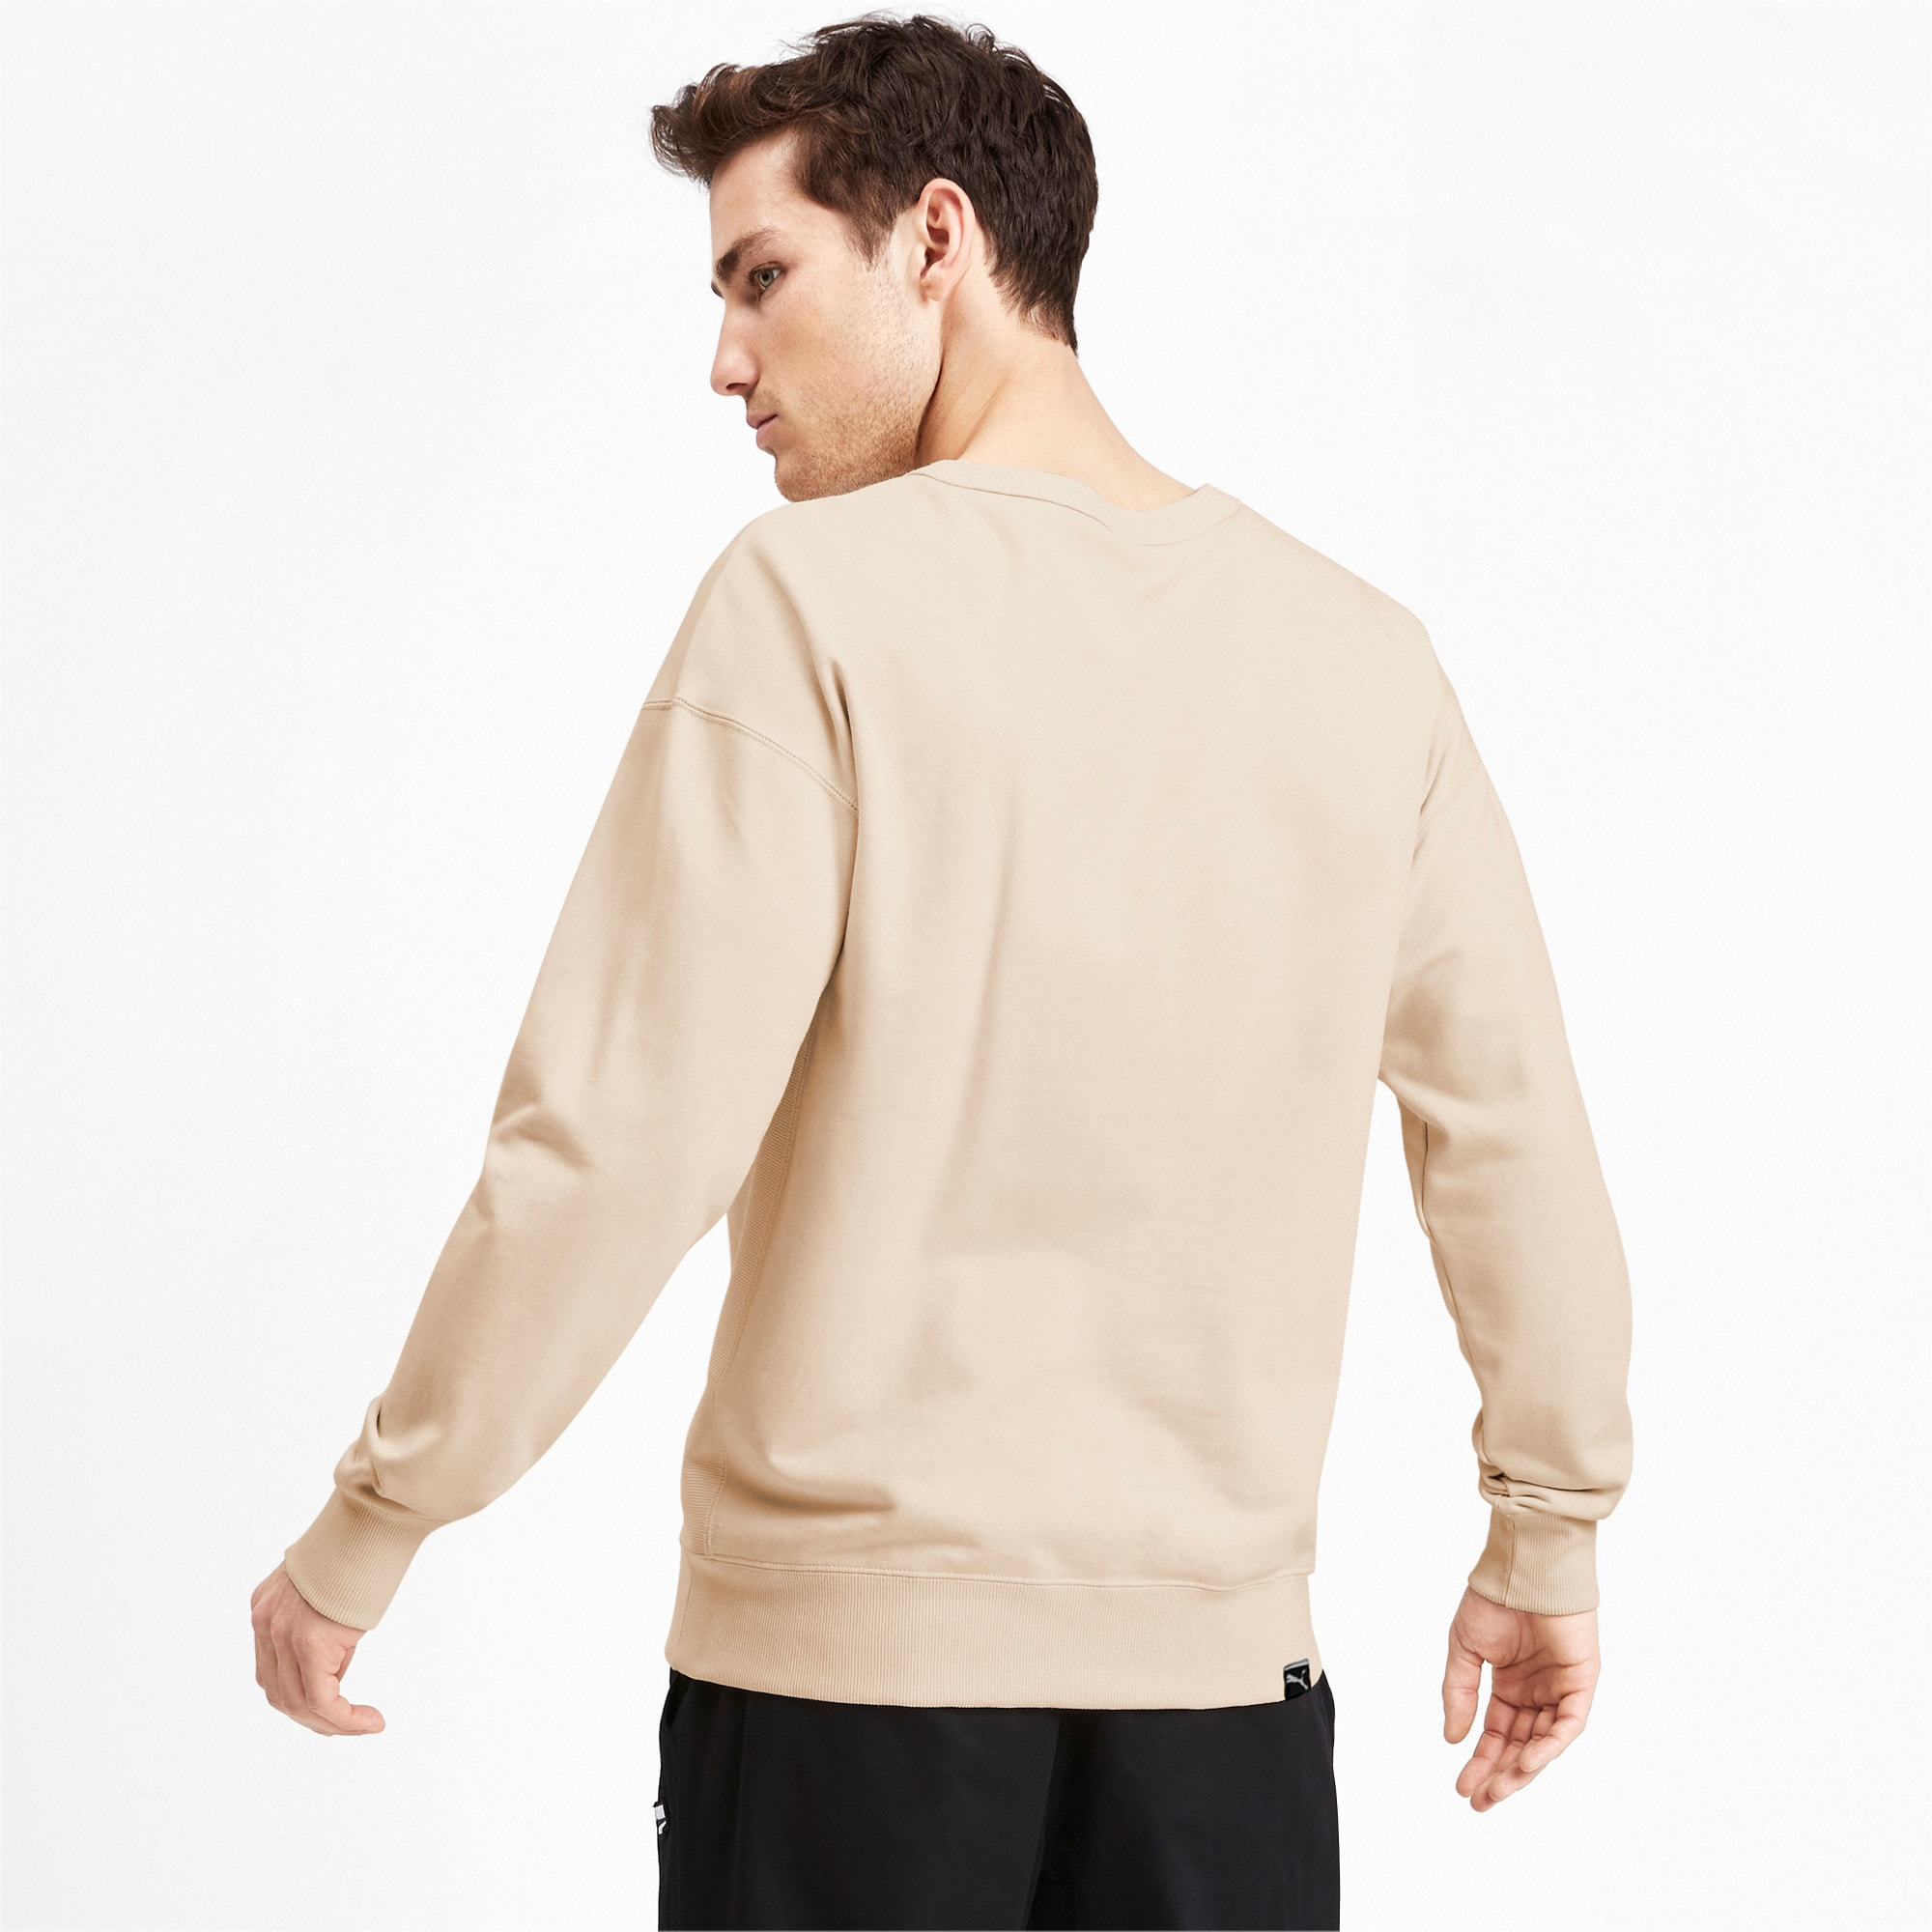 Thumbnail 3 of Downtown Men's Crewneck Sweatshirt, White Smoke, medium